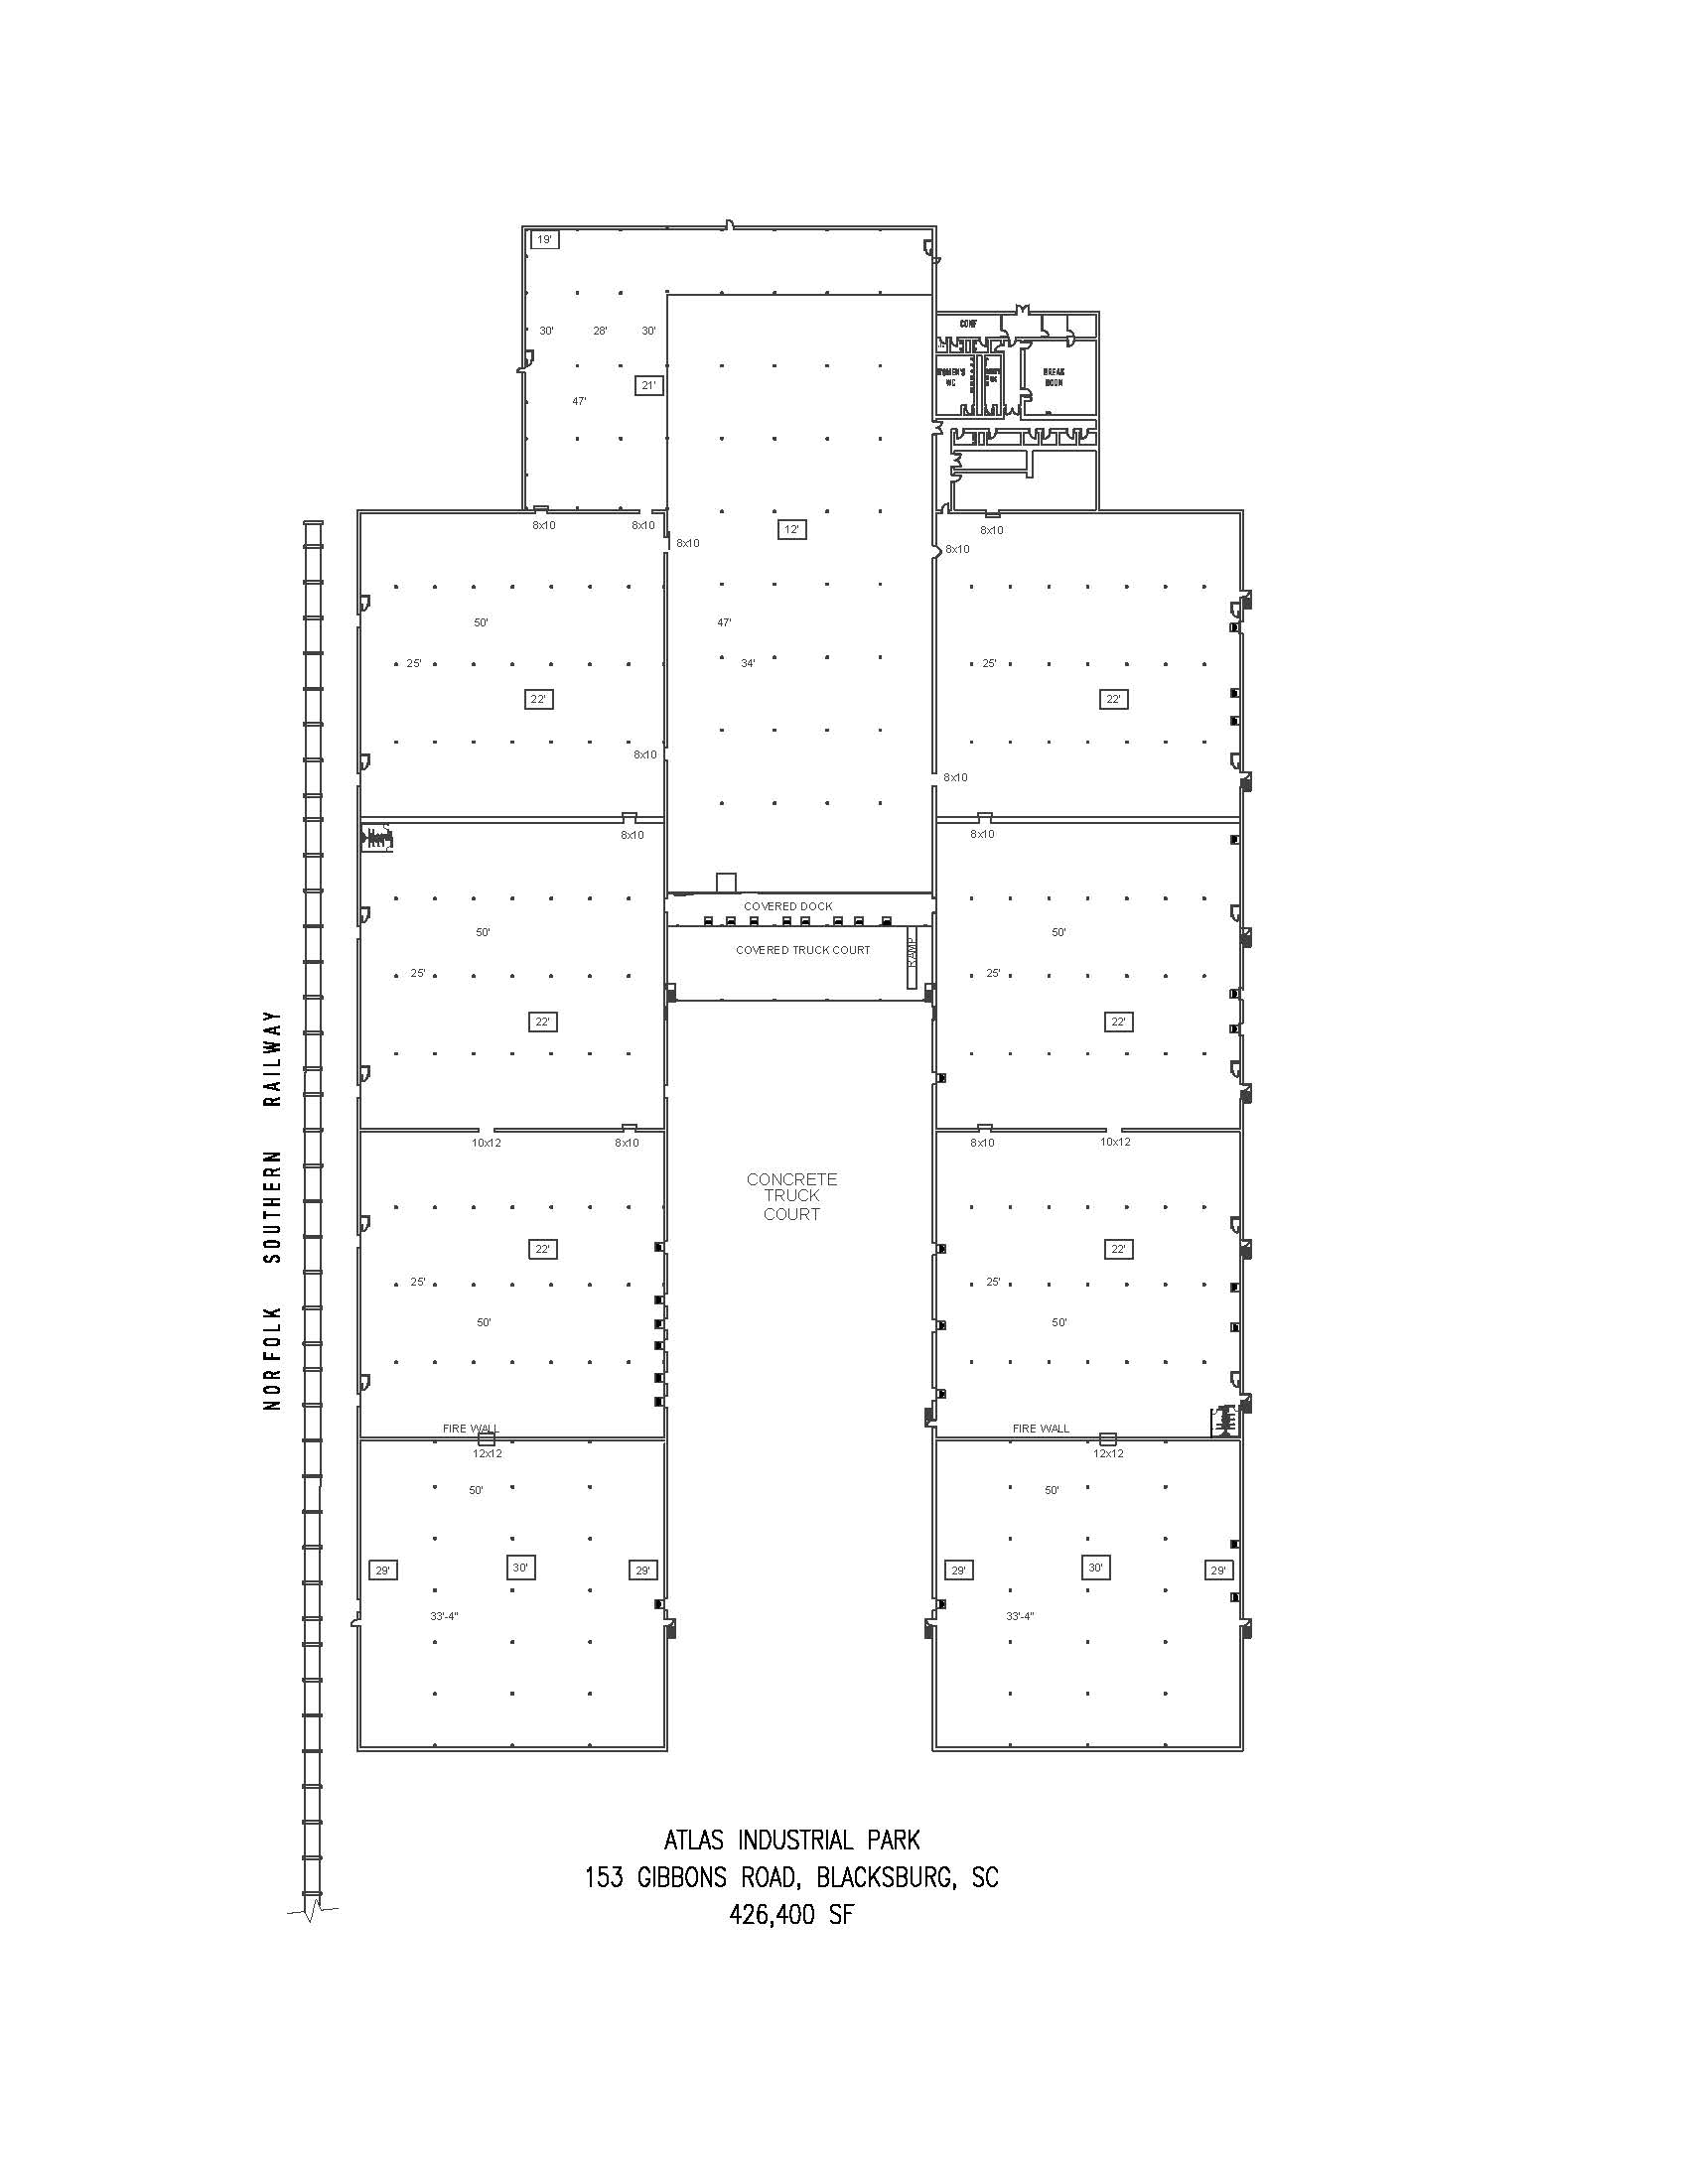 https://www.teamweston.com/wp-content/uploads/2021/01/Atlas-Ind.-Park-floor-plan.jpg